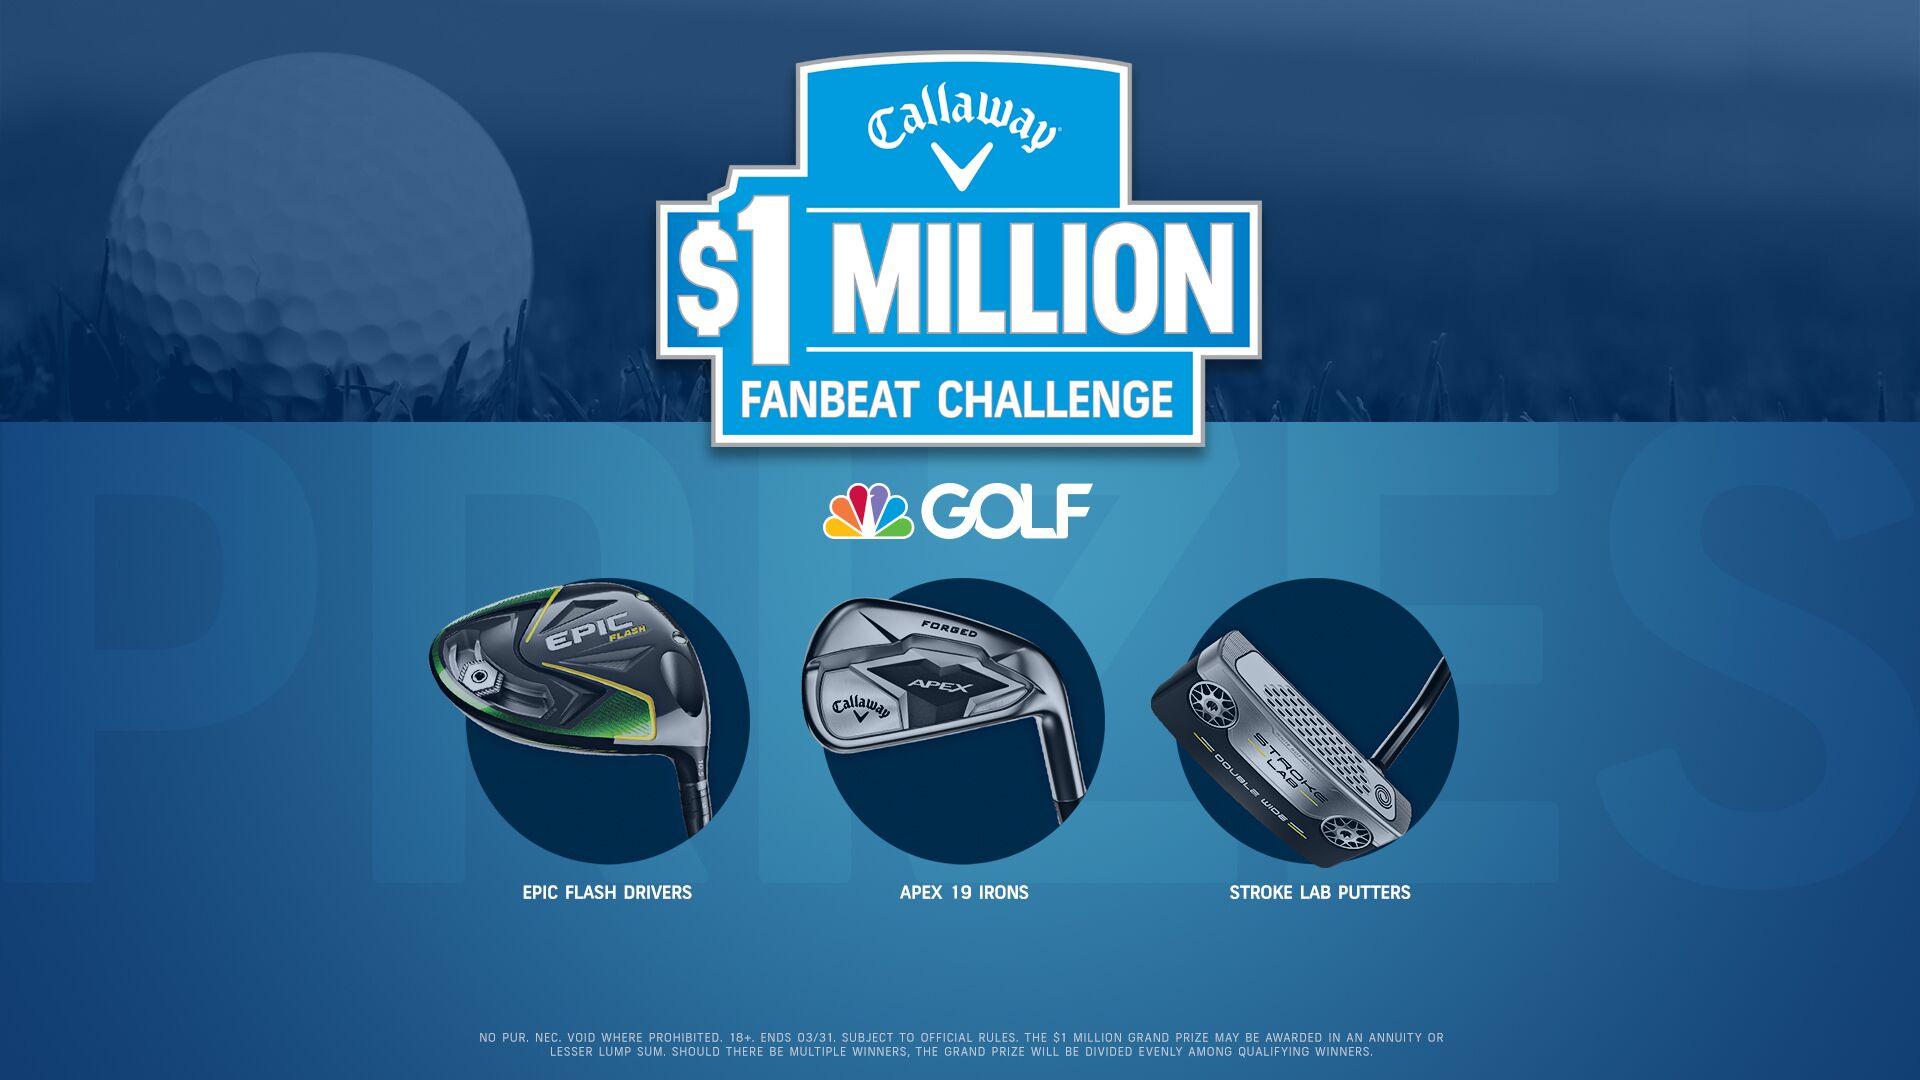 Callaway's $1 Million FanBeat Challenge 2019 | Golf Channel